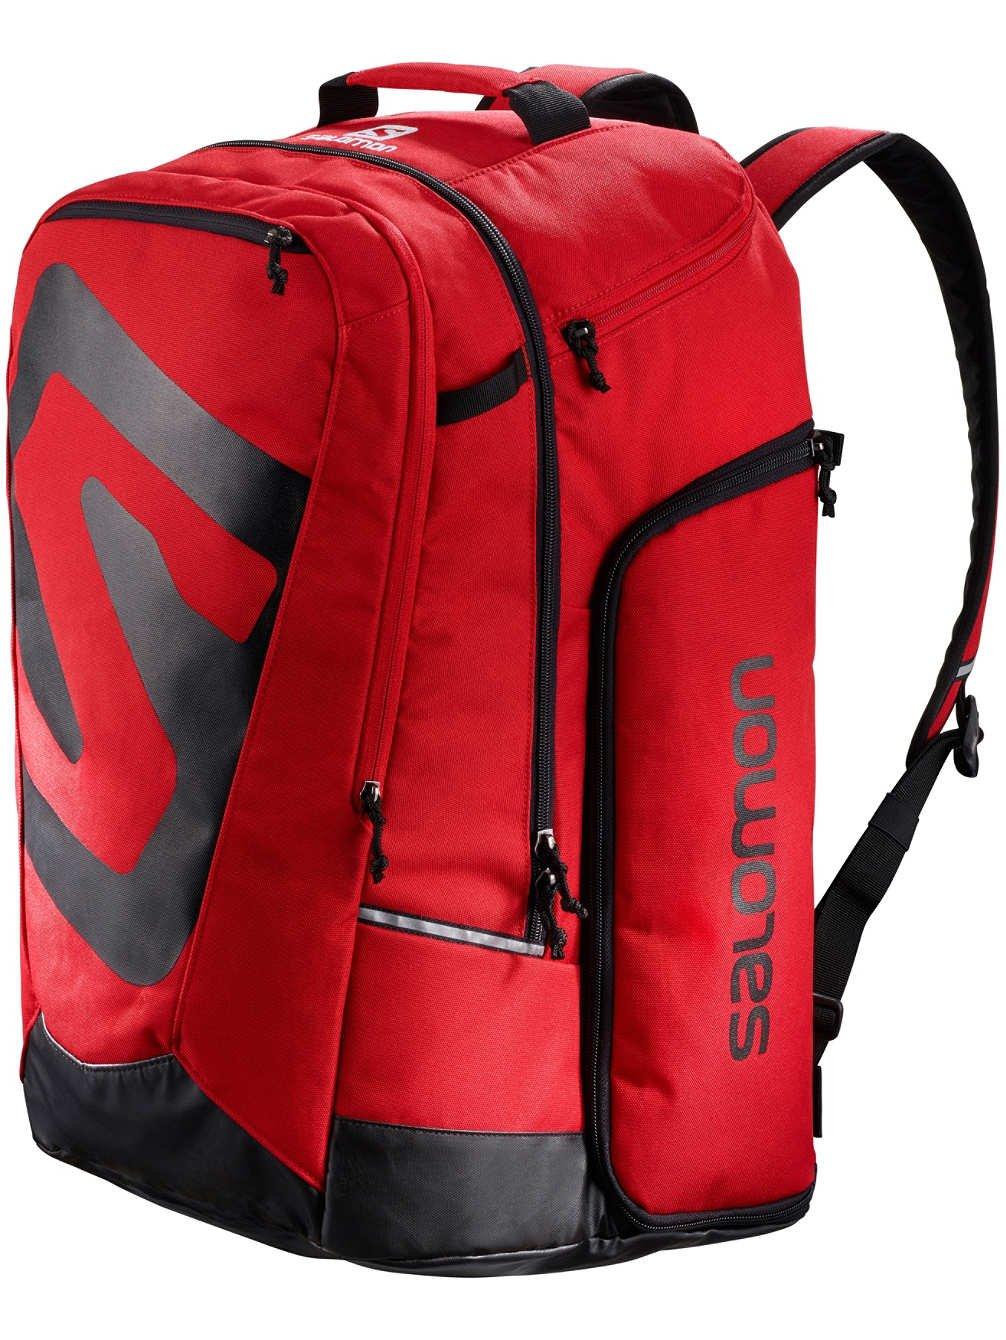 Salomon Extend Go-To-Snow Gear Bag, Barbados Cherry/Black